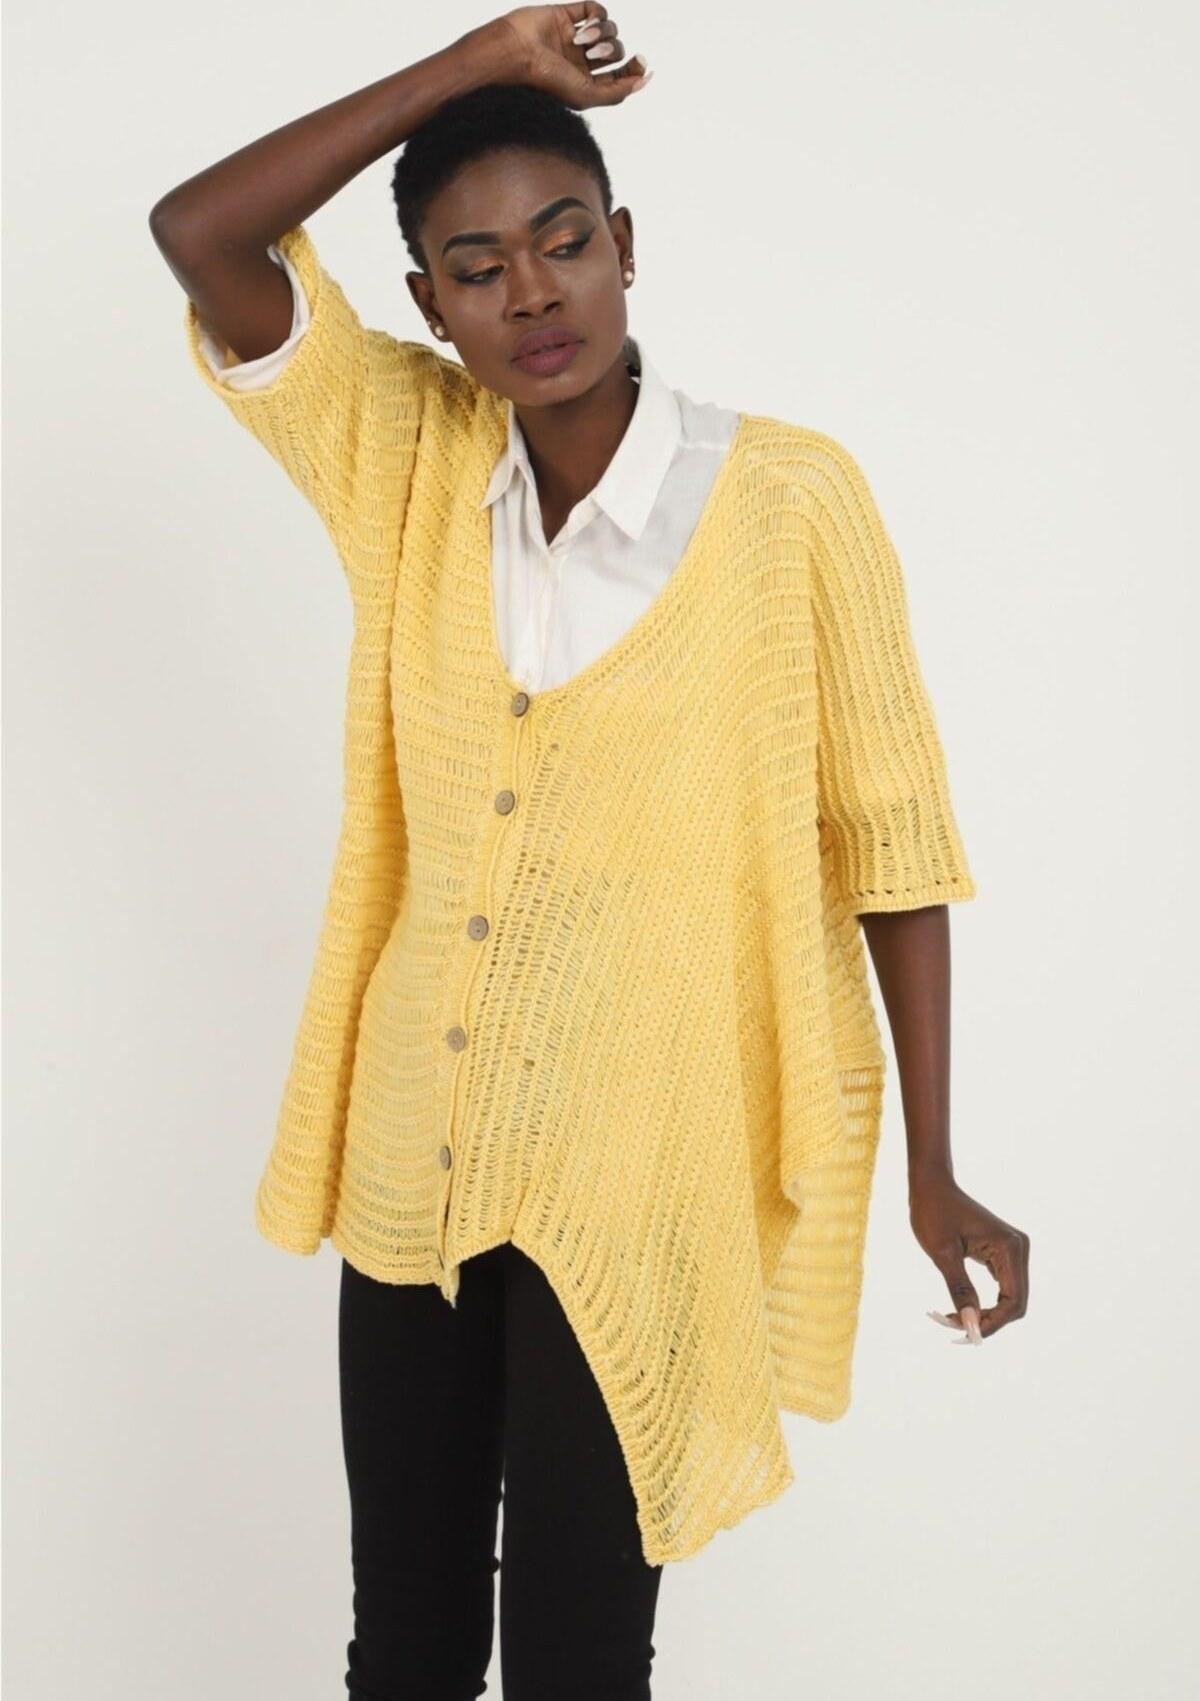 تصویر پلیور زنانه شیک جدید برند SCHS TEXTİL رنگ زرد ty106254212